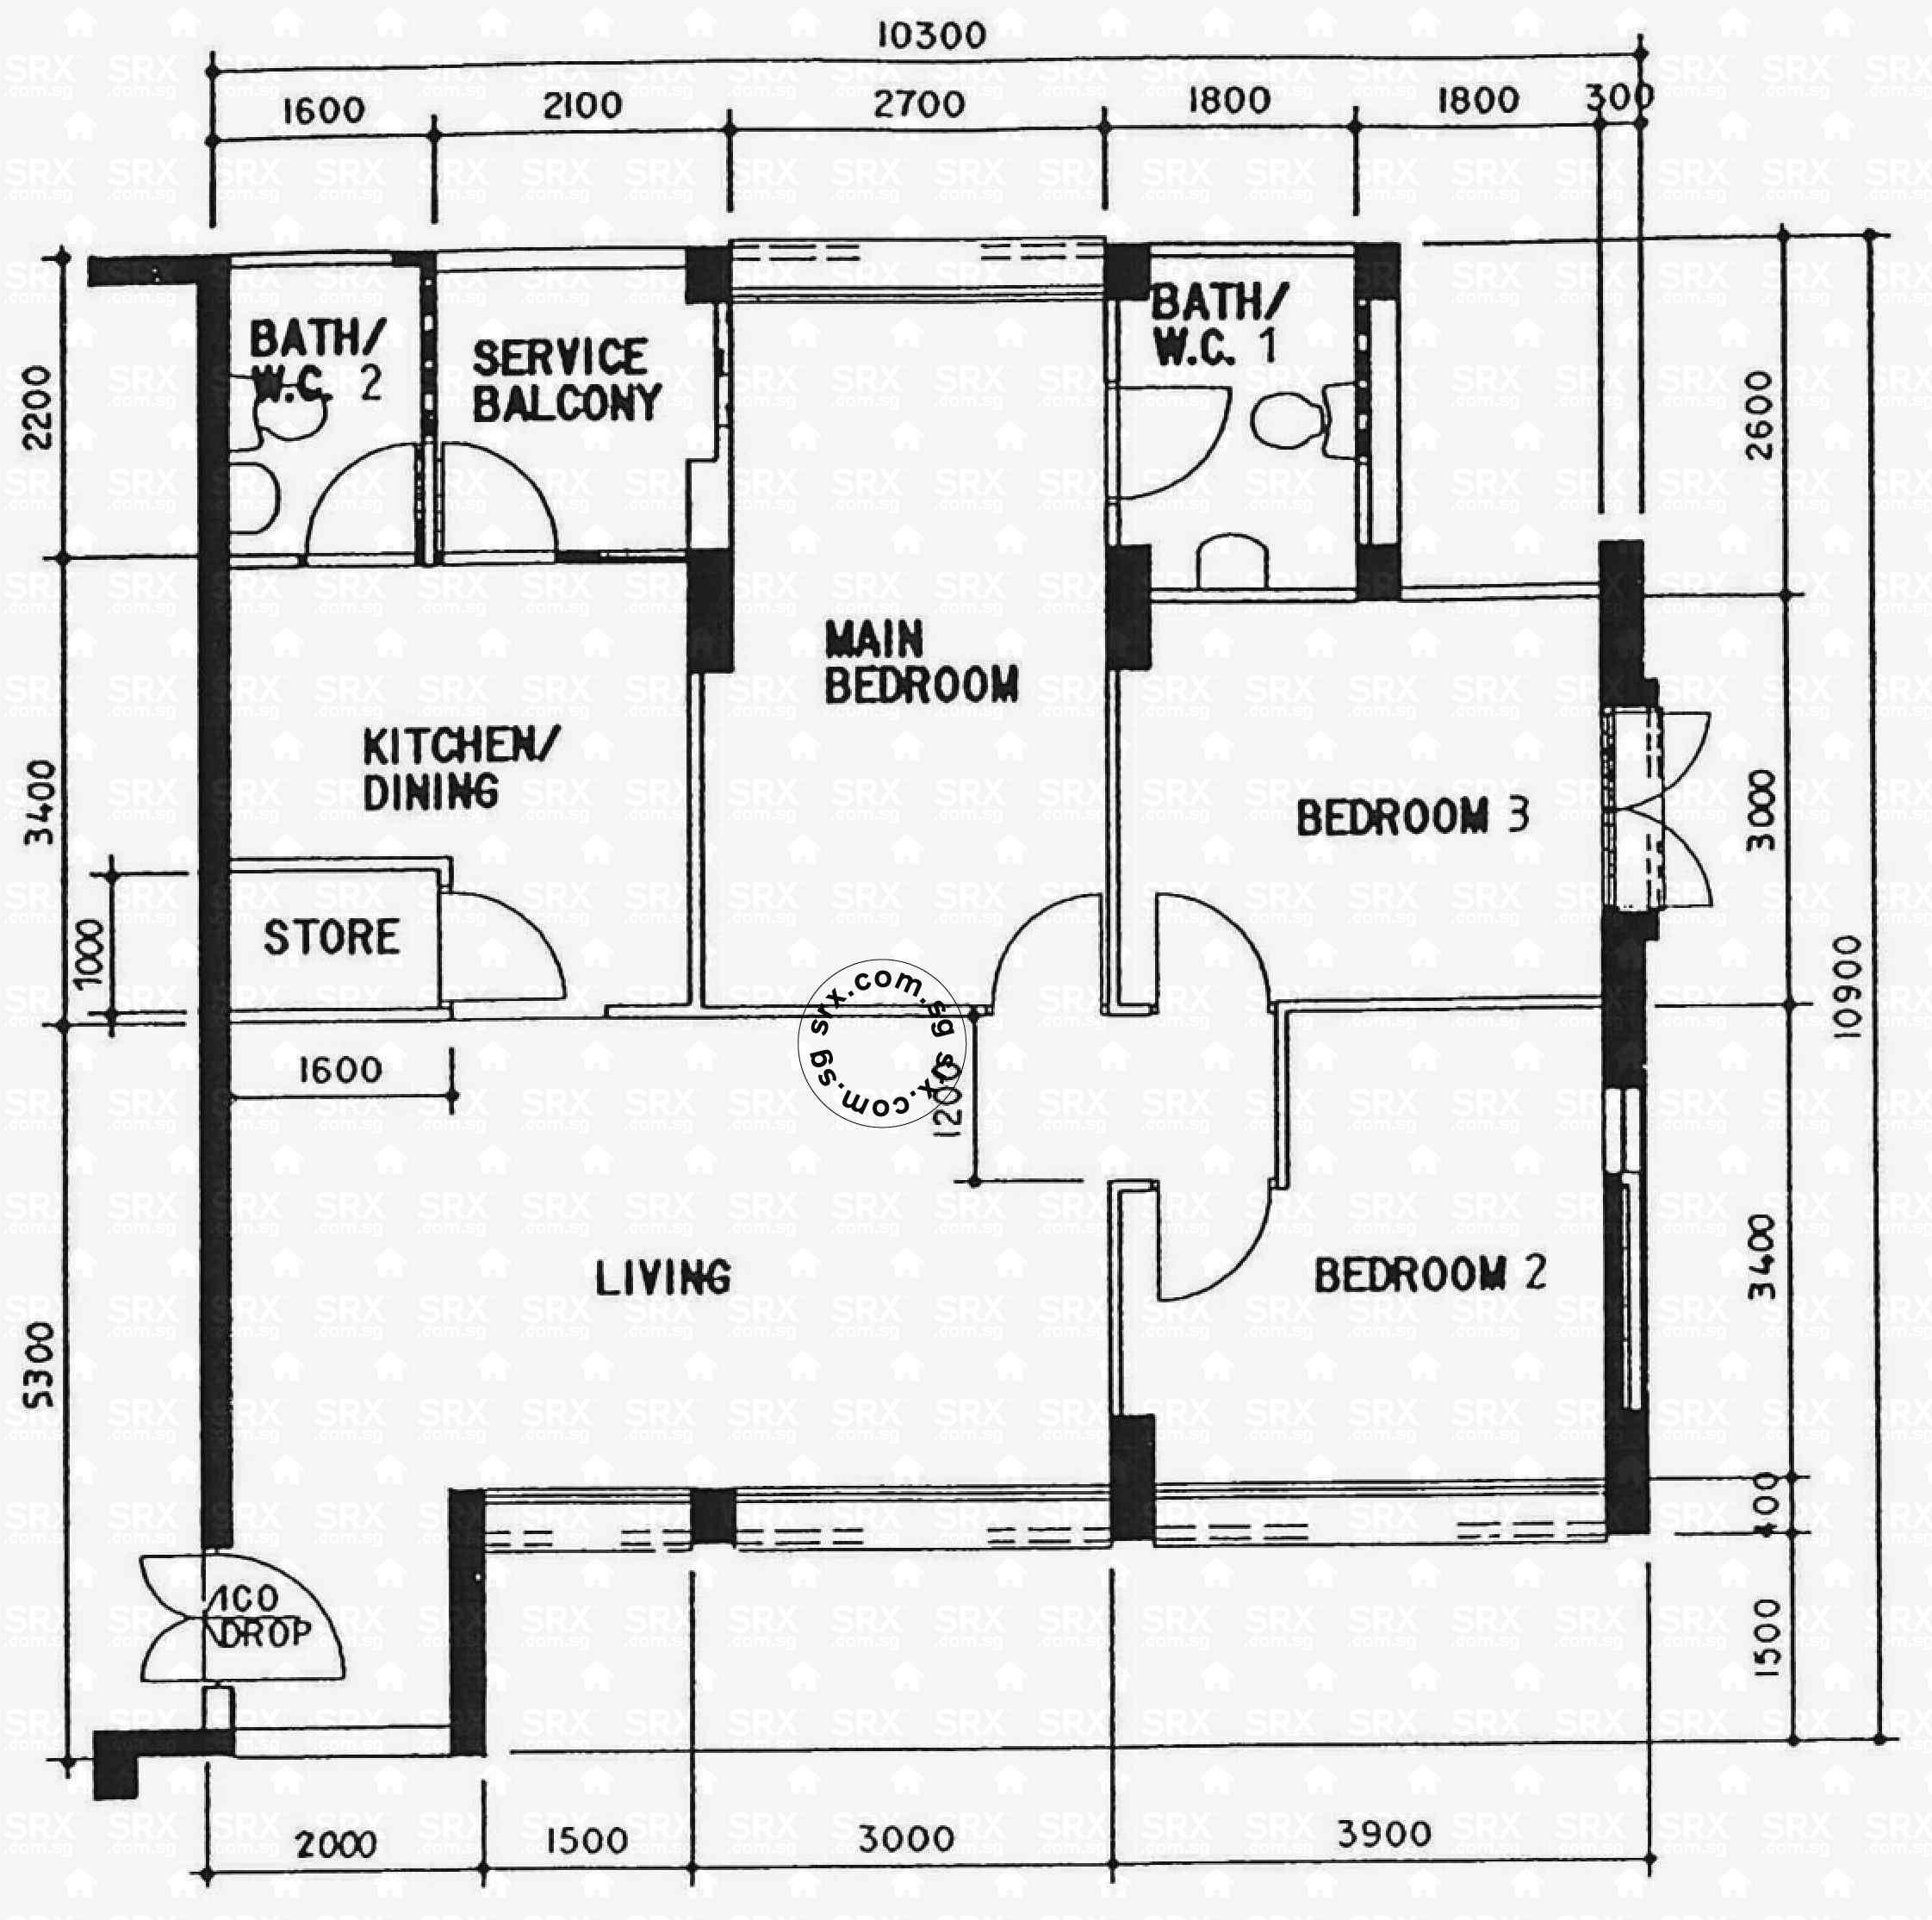 Jelapang Road Bukit Panjang Hdb 4 Rooms For Rent